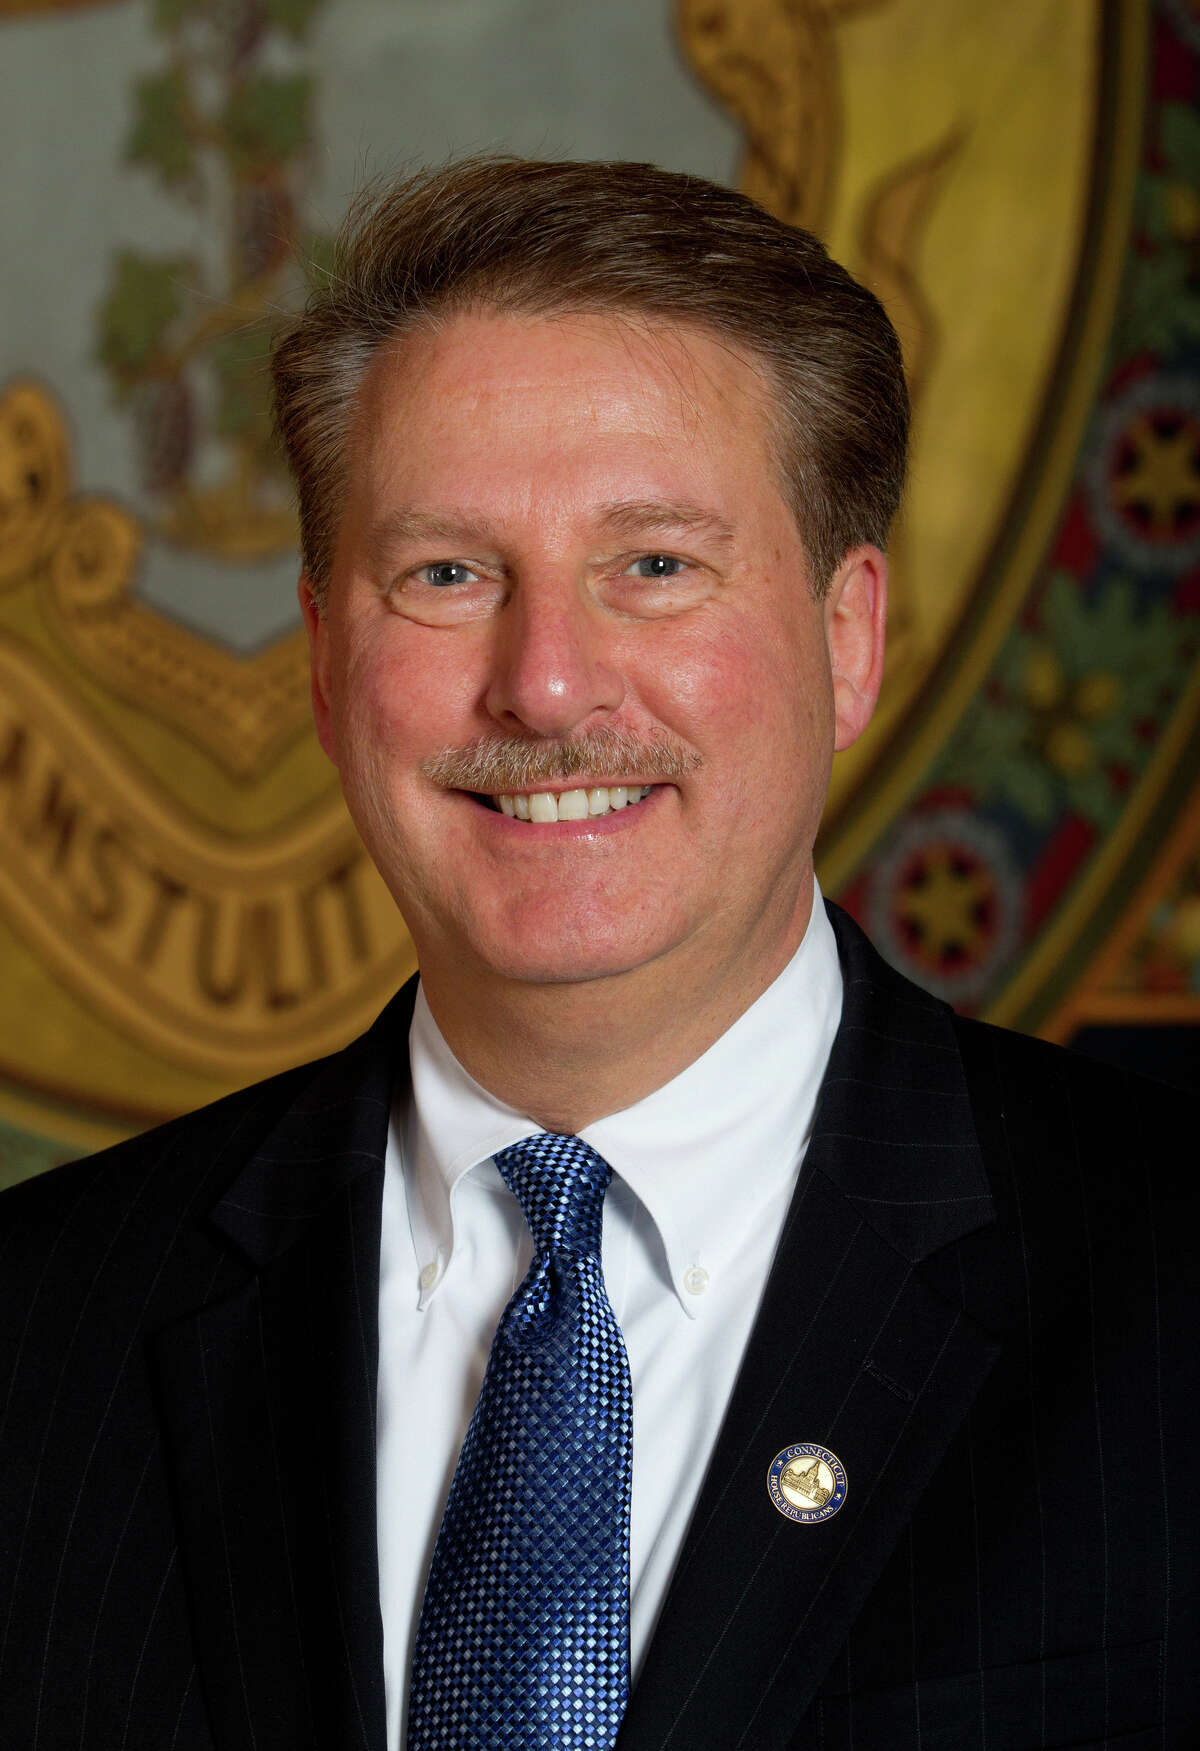 state Rep. David Scribner